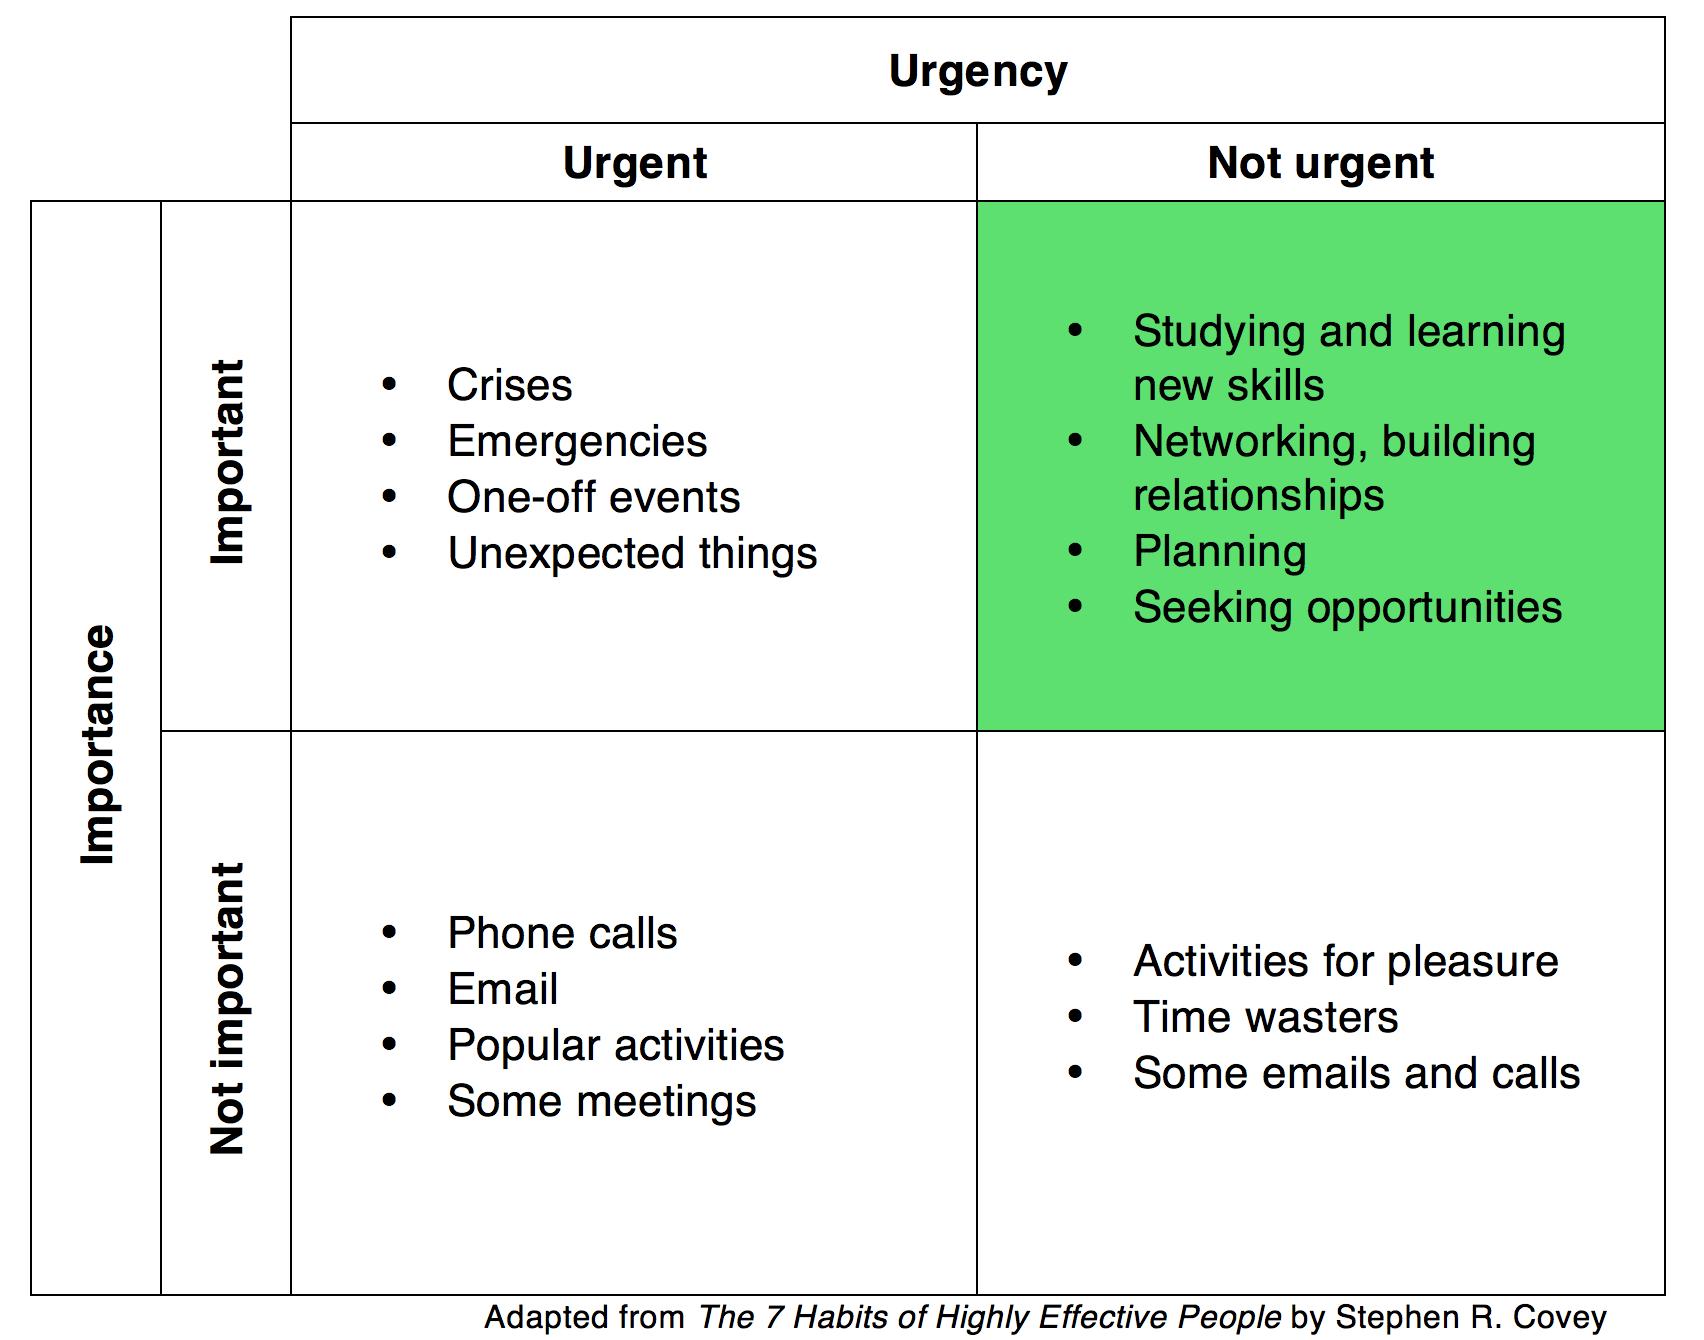 time-management-matrix-screenshot.png